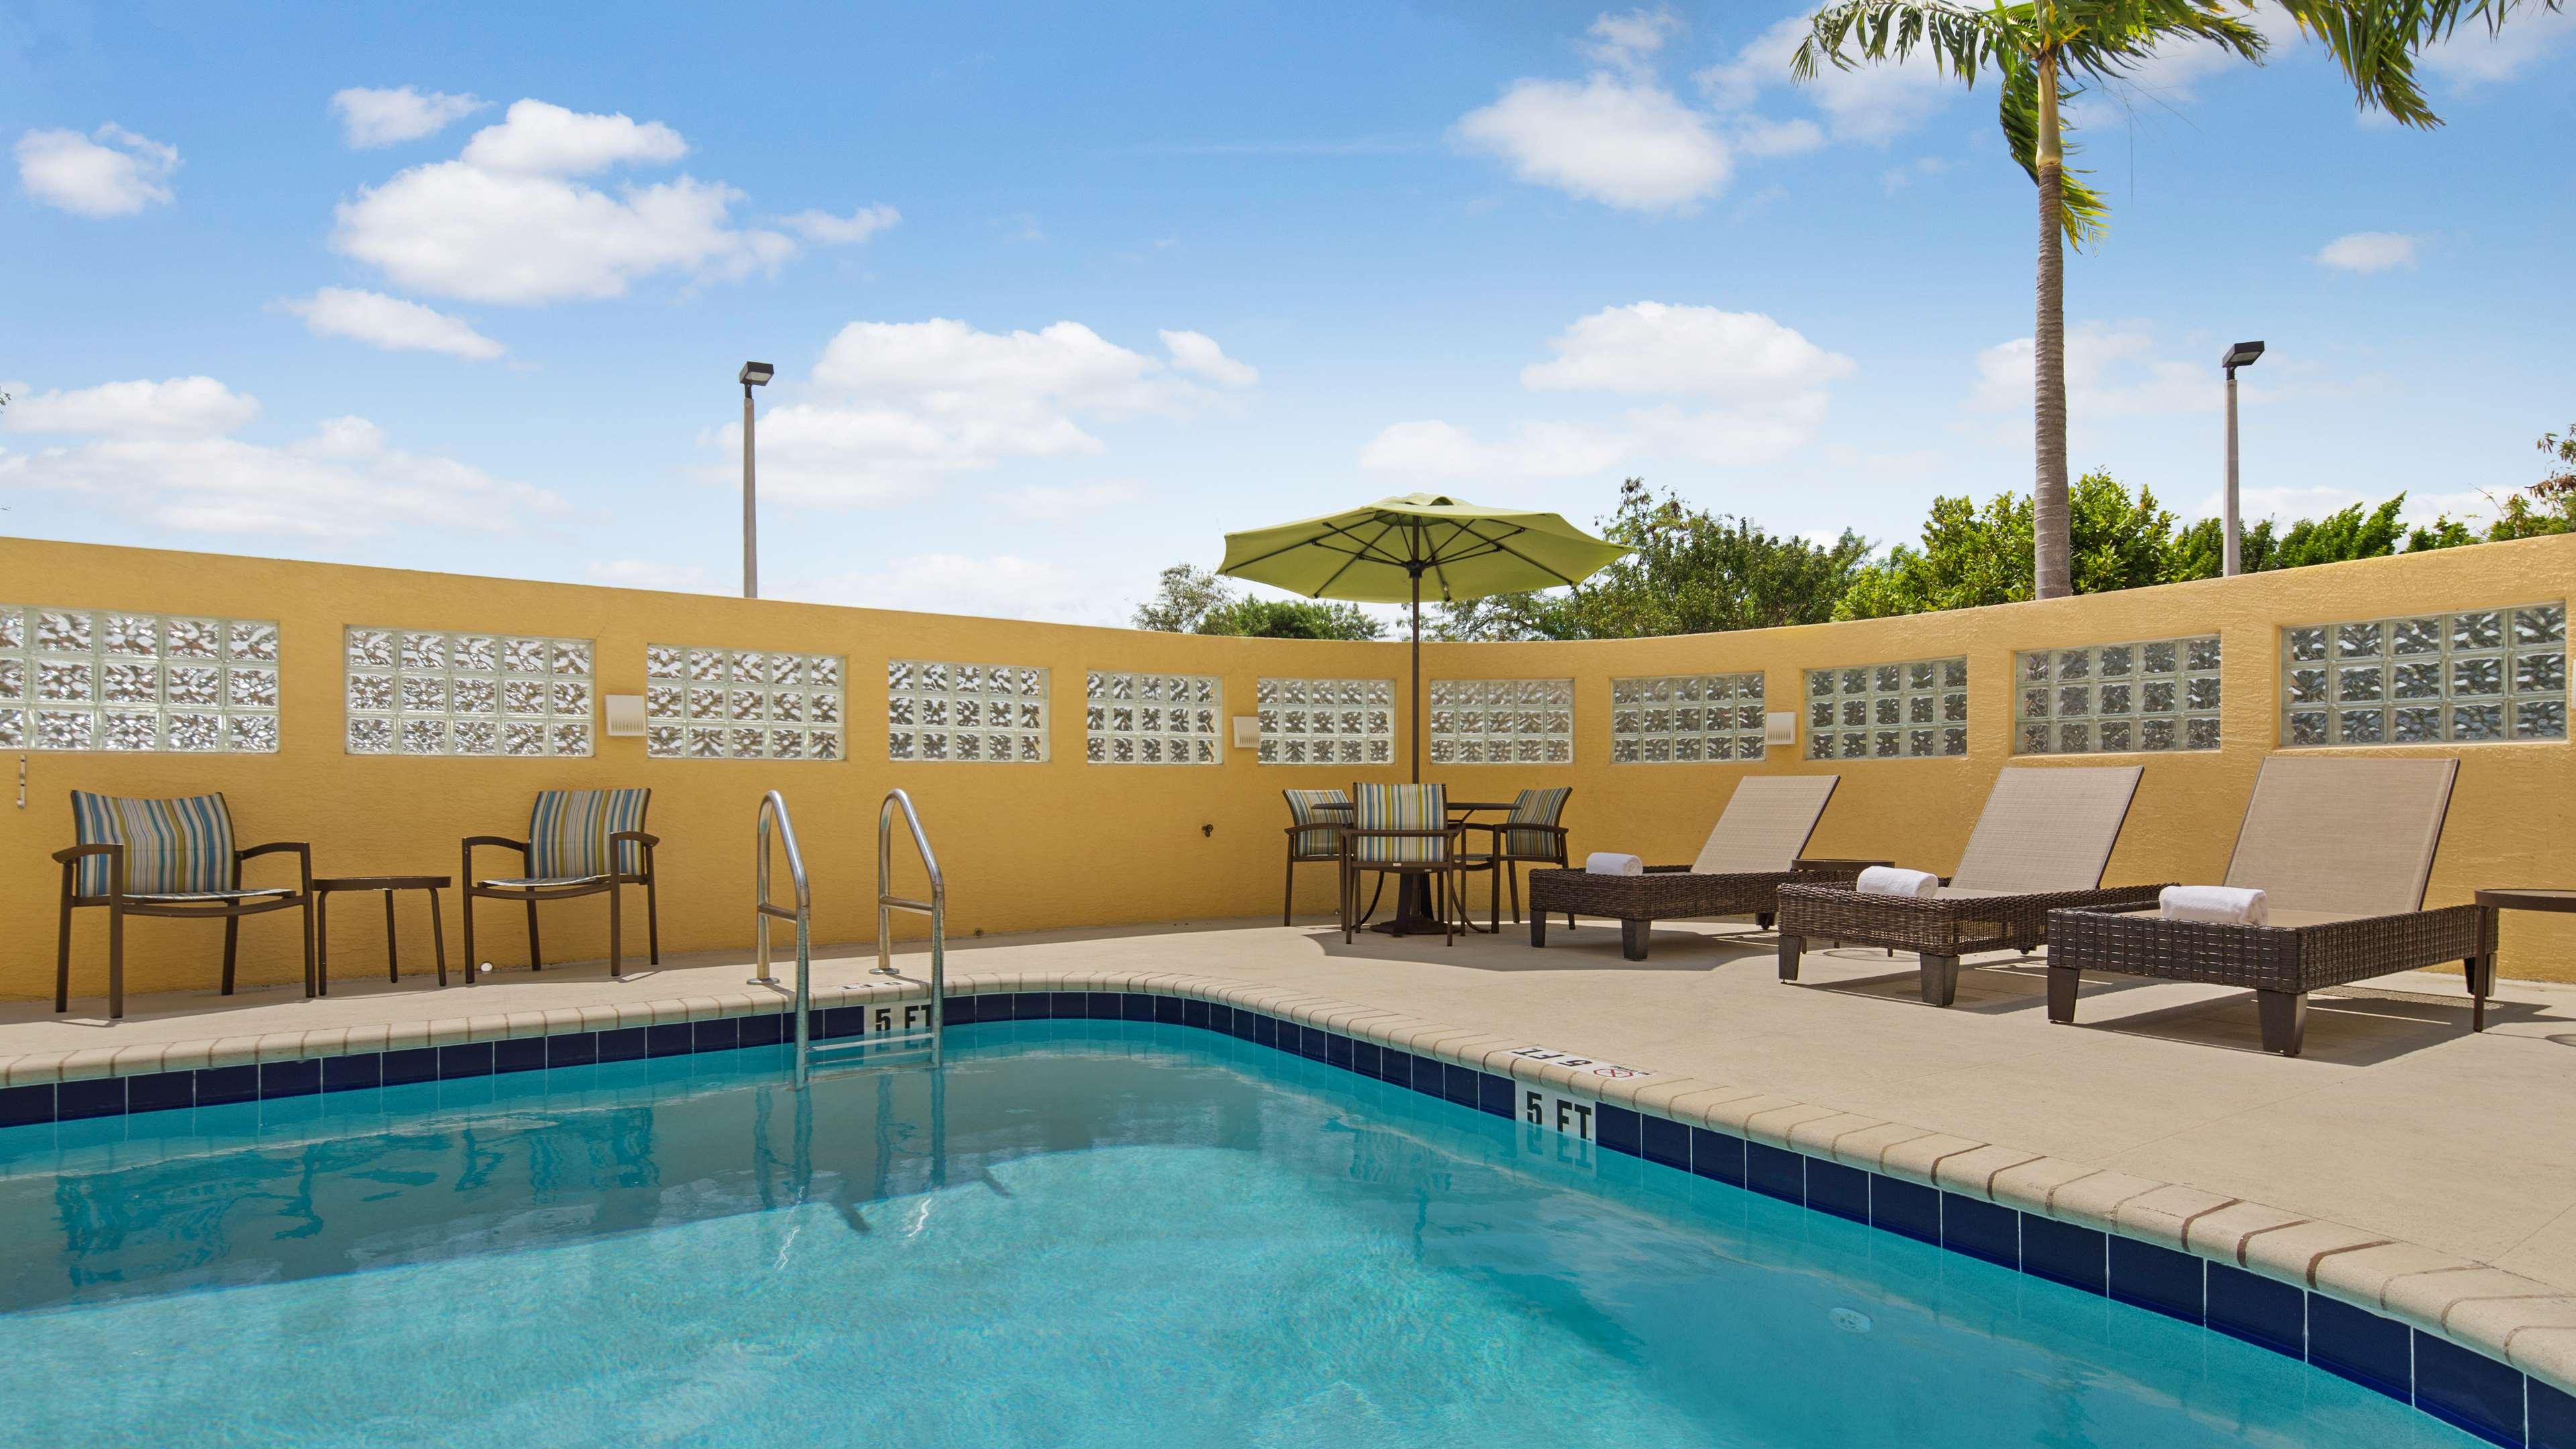 Best Western Plus Kendall Airport Hotel & Suites image 5